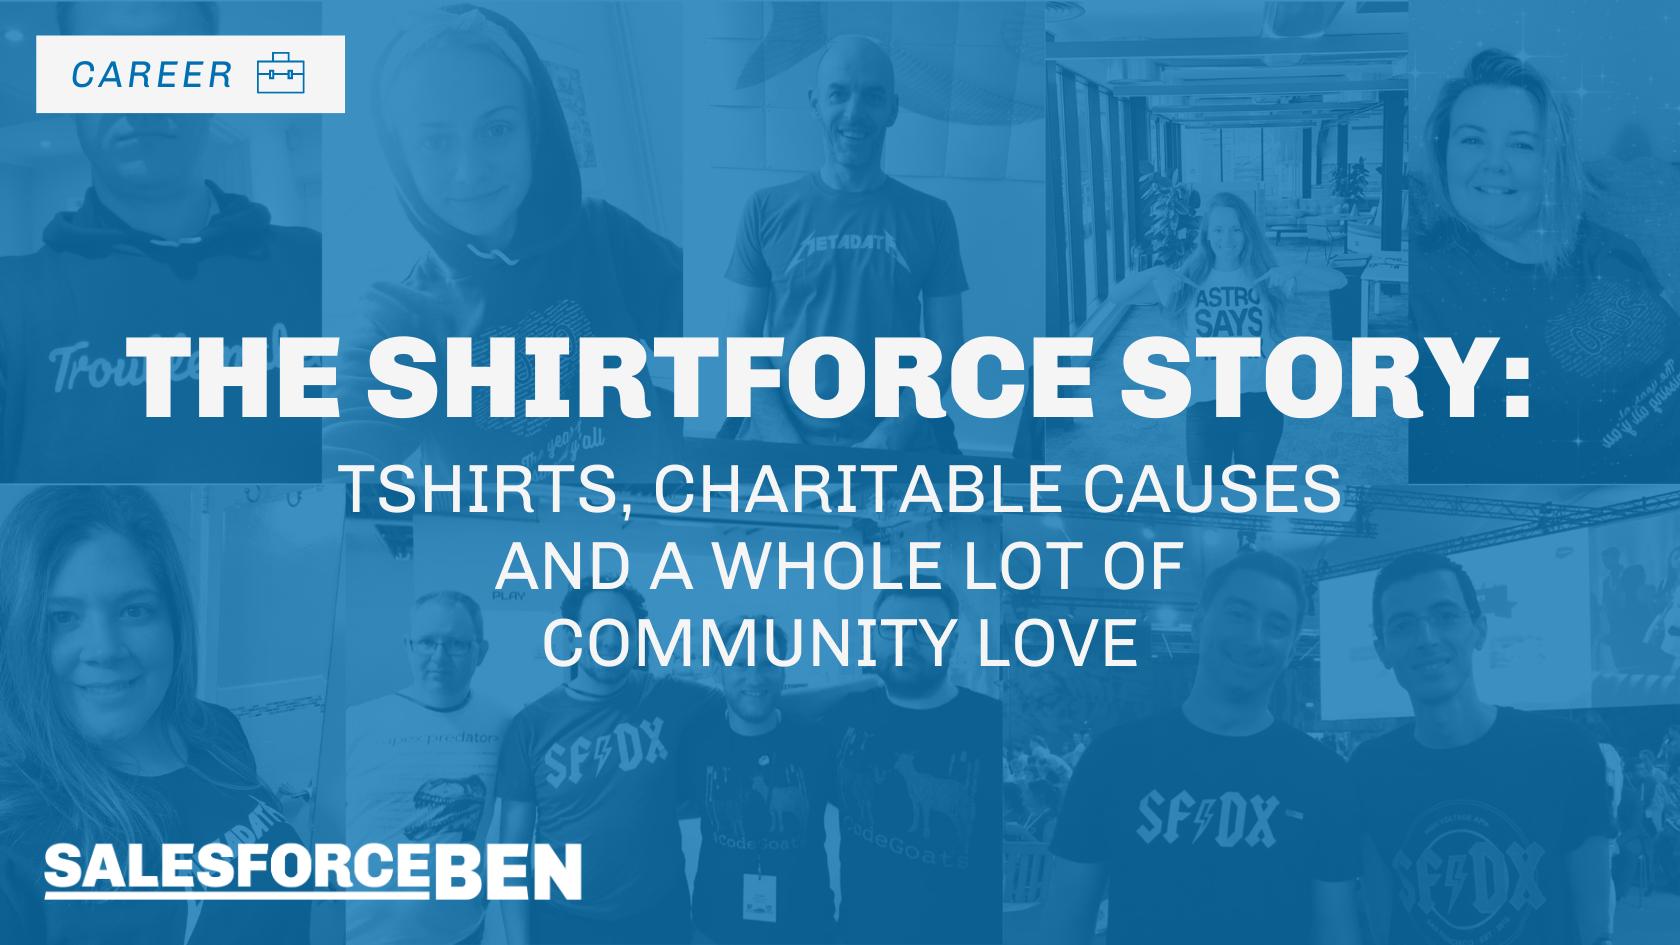 The Shirtforce Story: T-shirts & Charitable Causes